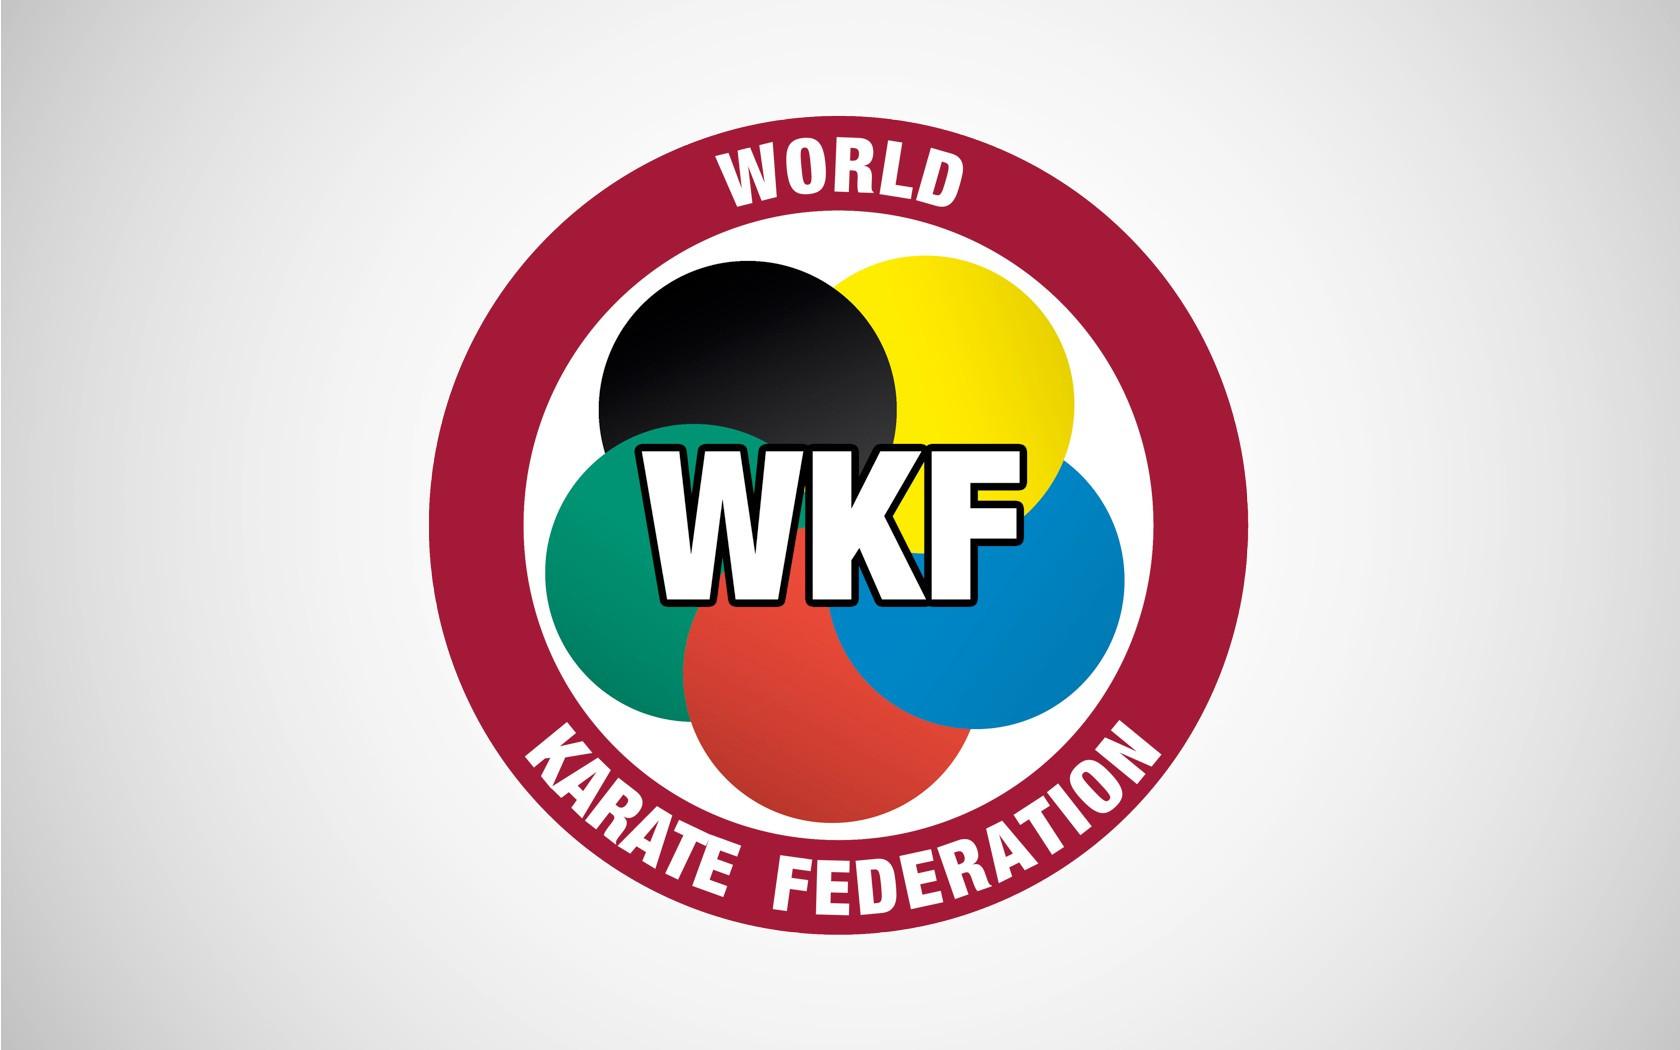 Вице-президент Федерации каратэ Казахстана принял участие в конференции исполкома  WKF